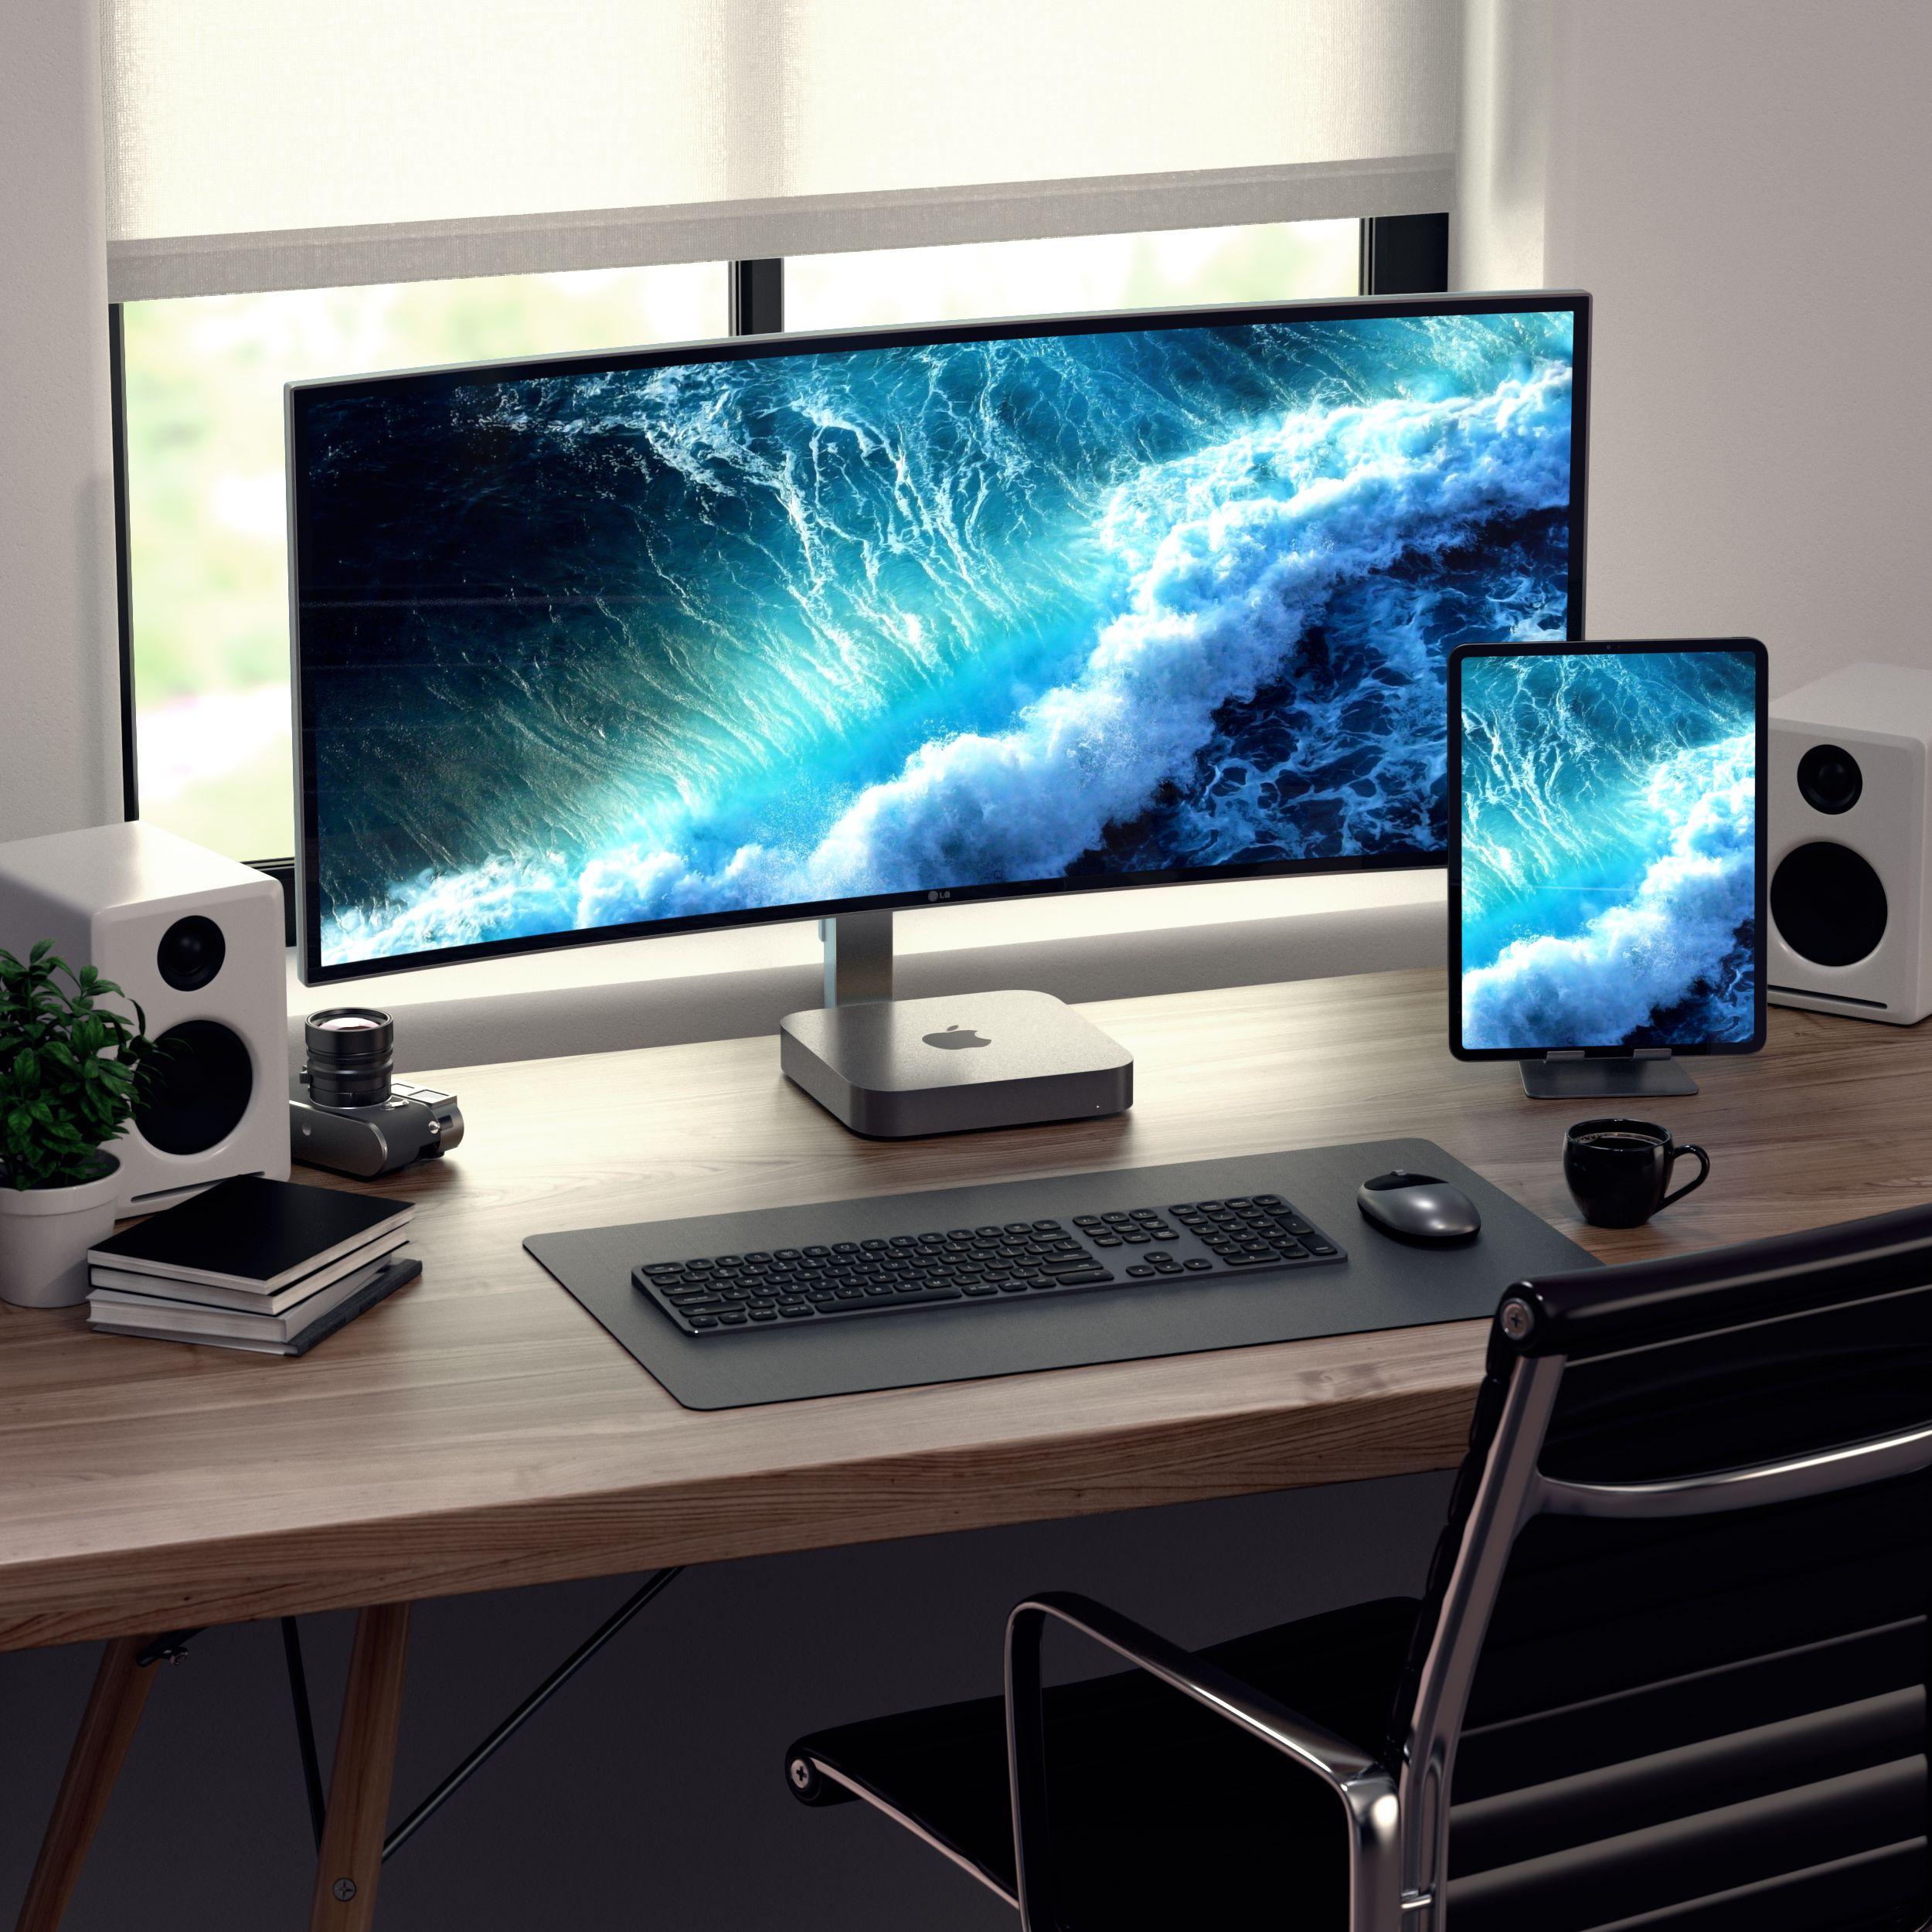 Aluminum Bluetooth Keyboard Desk Setup Computer Desk Setup